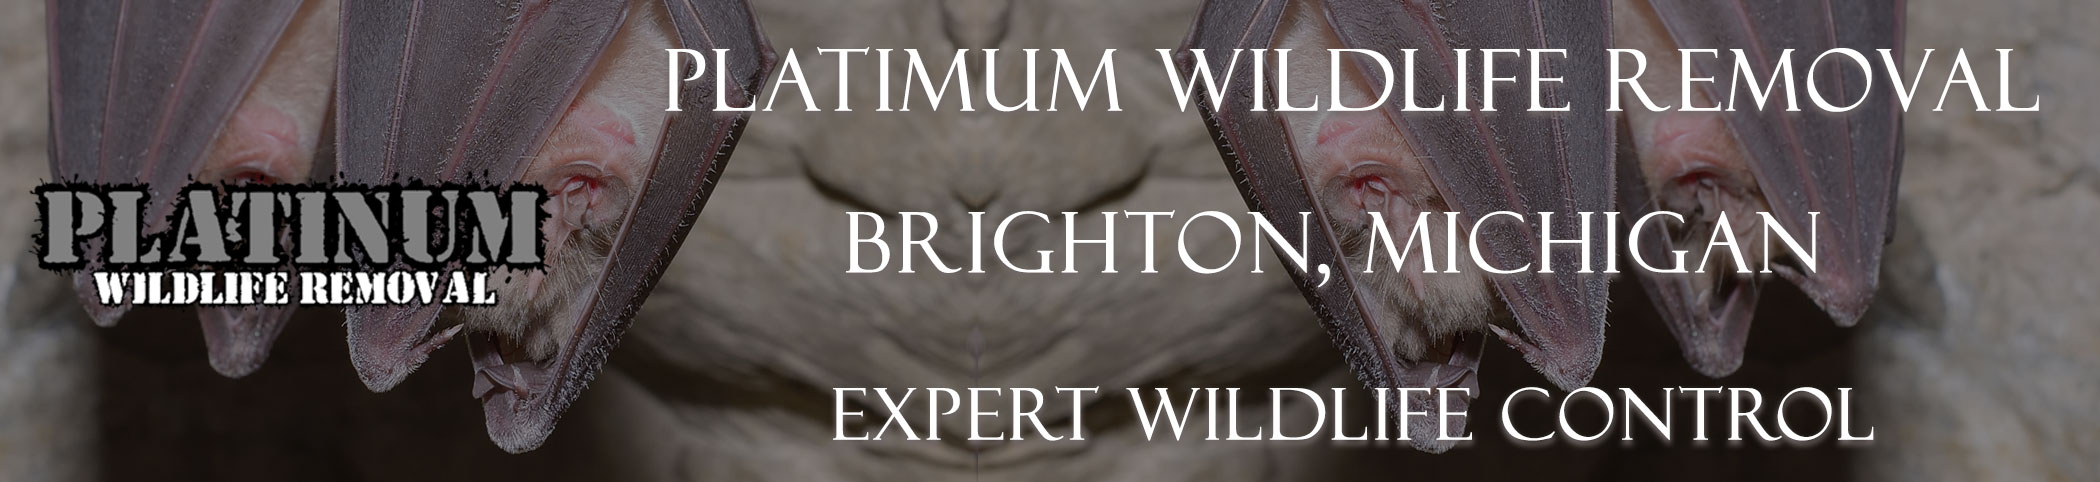 Brighton-Platinum-Wildlife-Removal-michgan